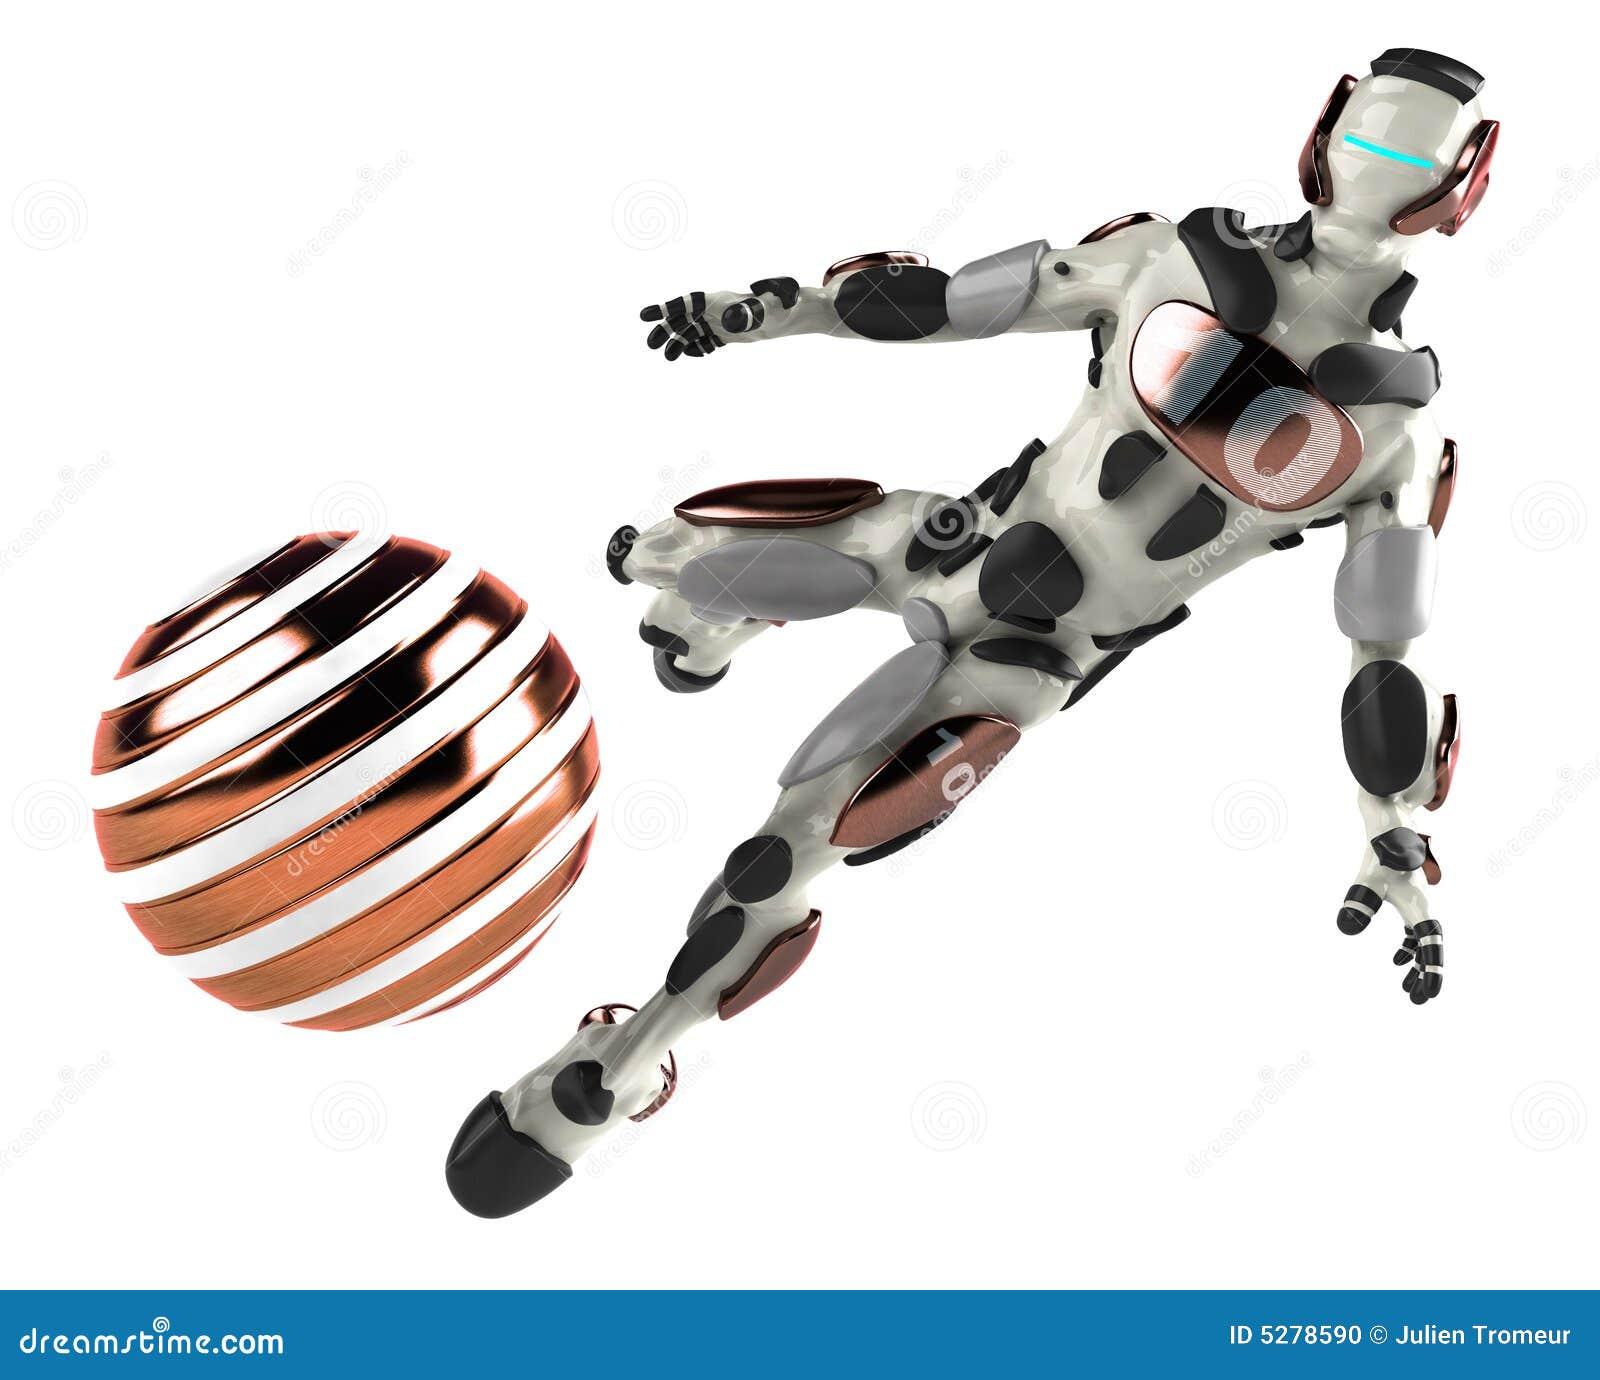 futurism and soccer player Dynamism of a soccer player artista: umberto boccioni tamaño: 1,93 m x 2,01 m período: futurismo tema: futbolista género: arte abstracto técnica: pintura al aceite.